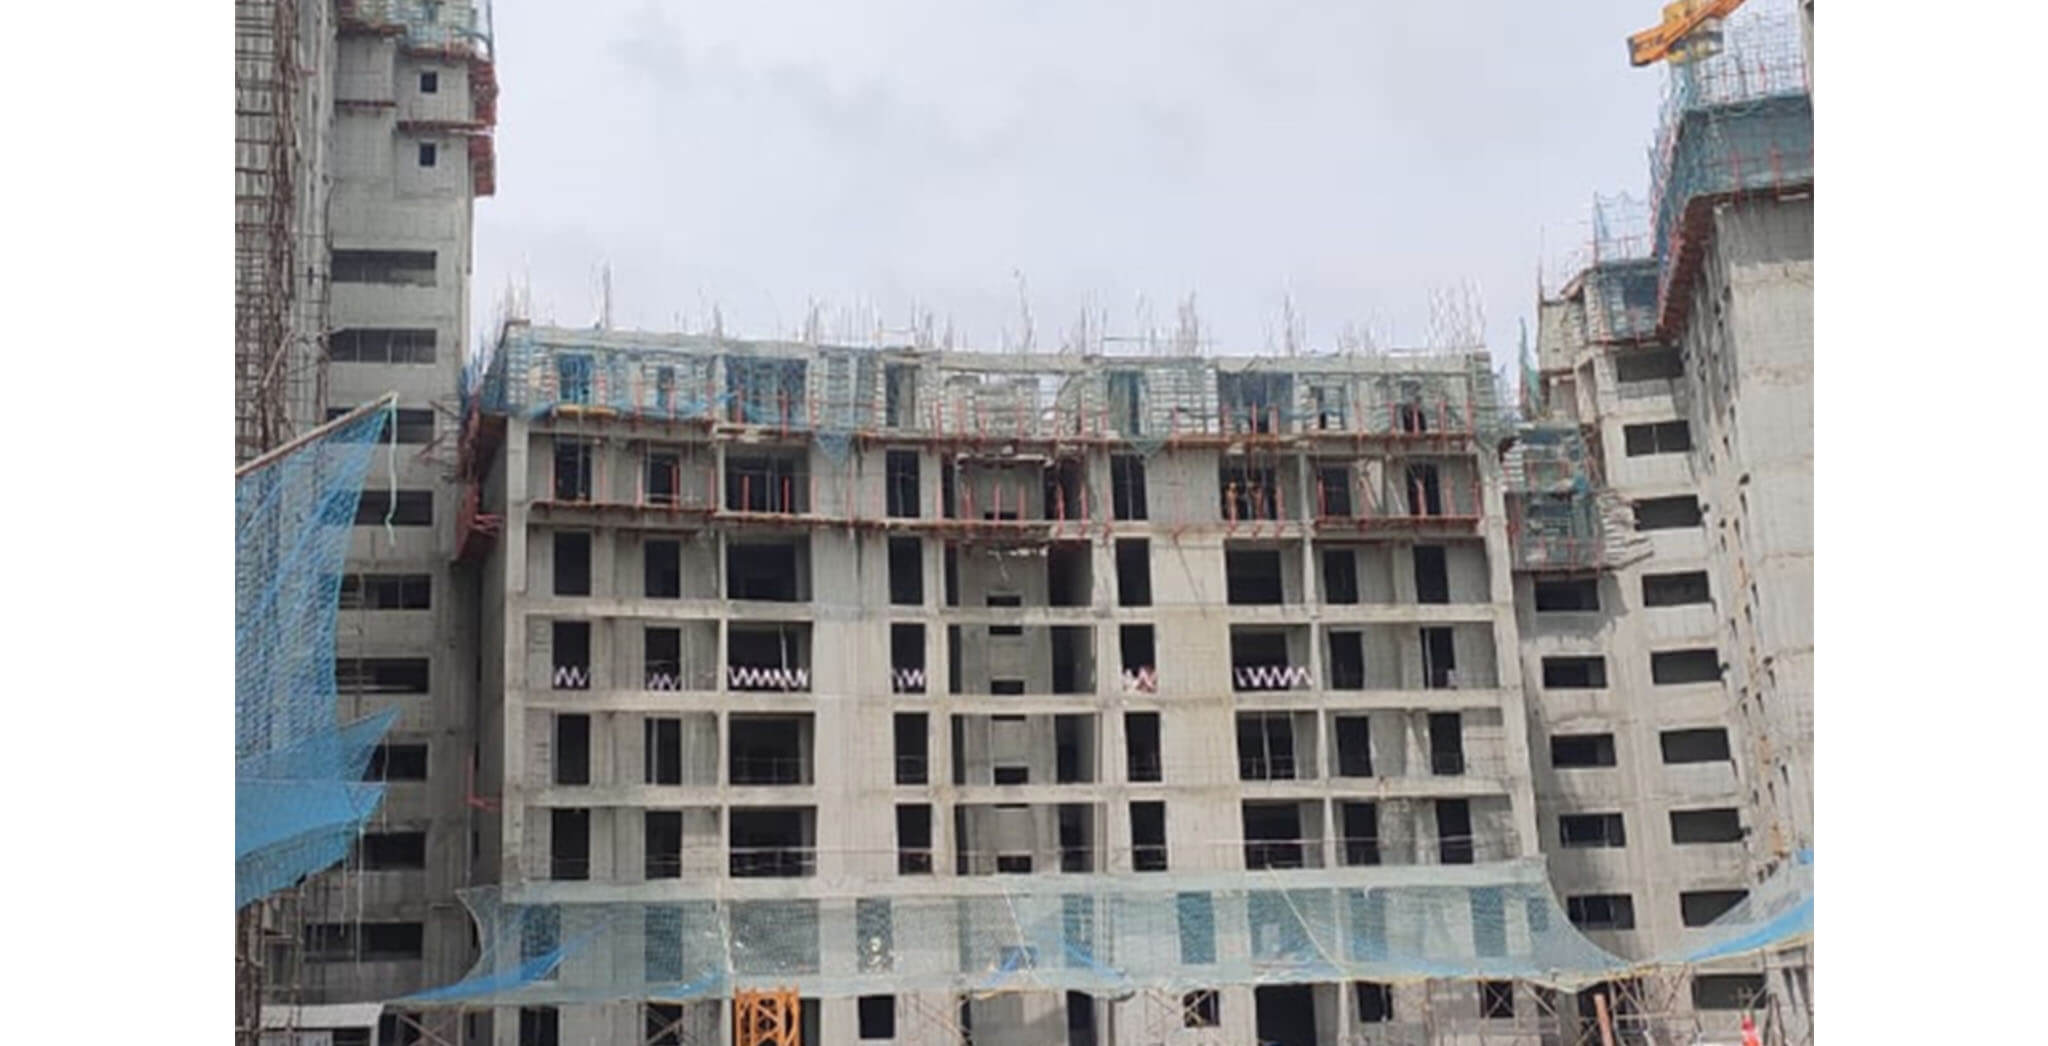 Sep 2020 - Serene: 8th floor structure work-in-progress